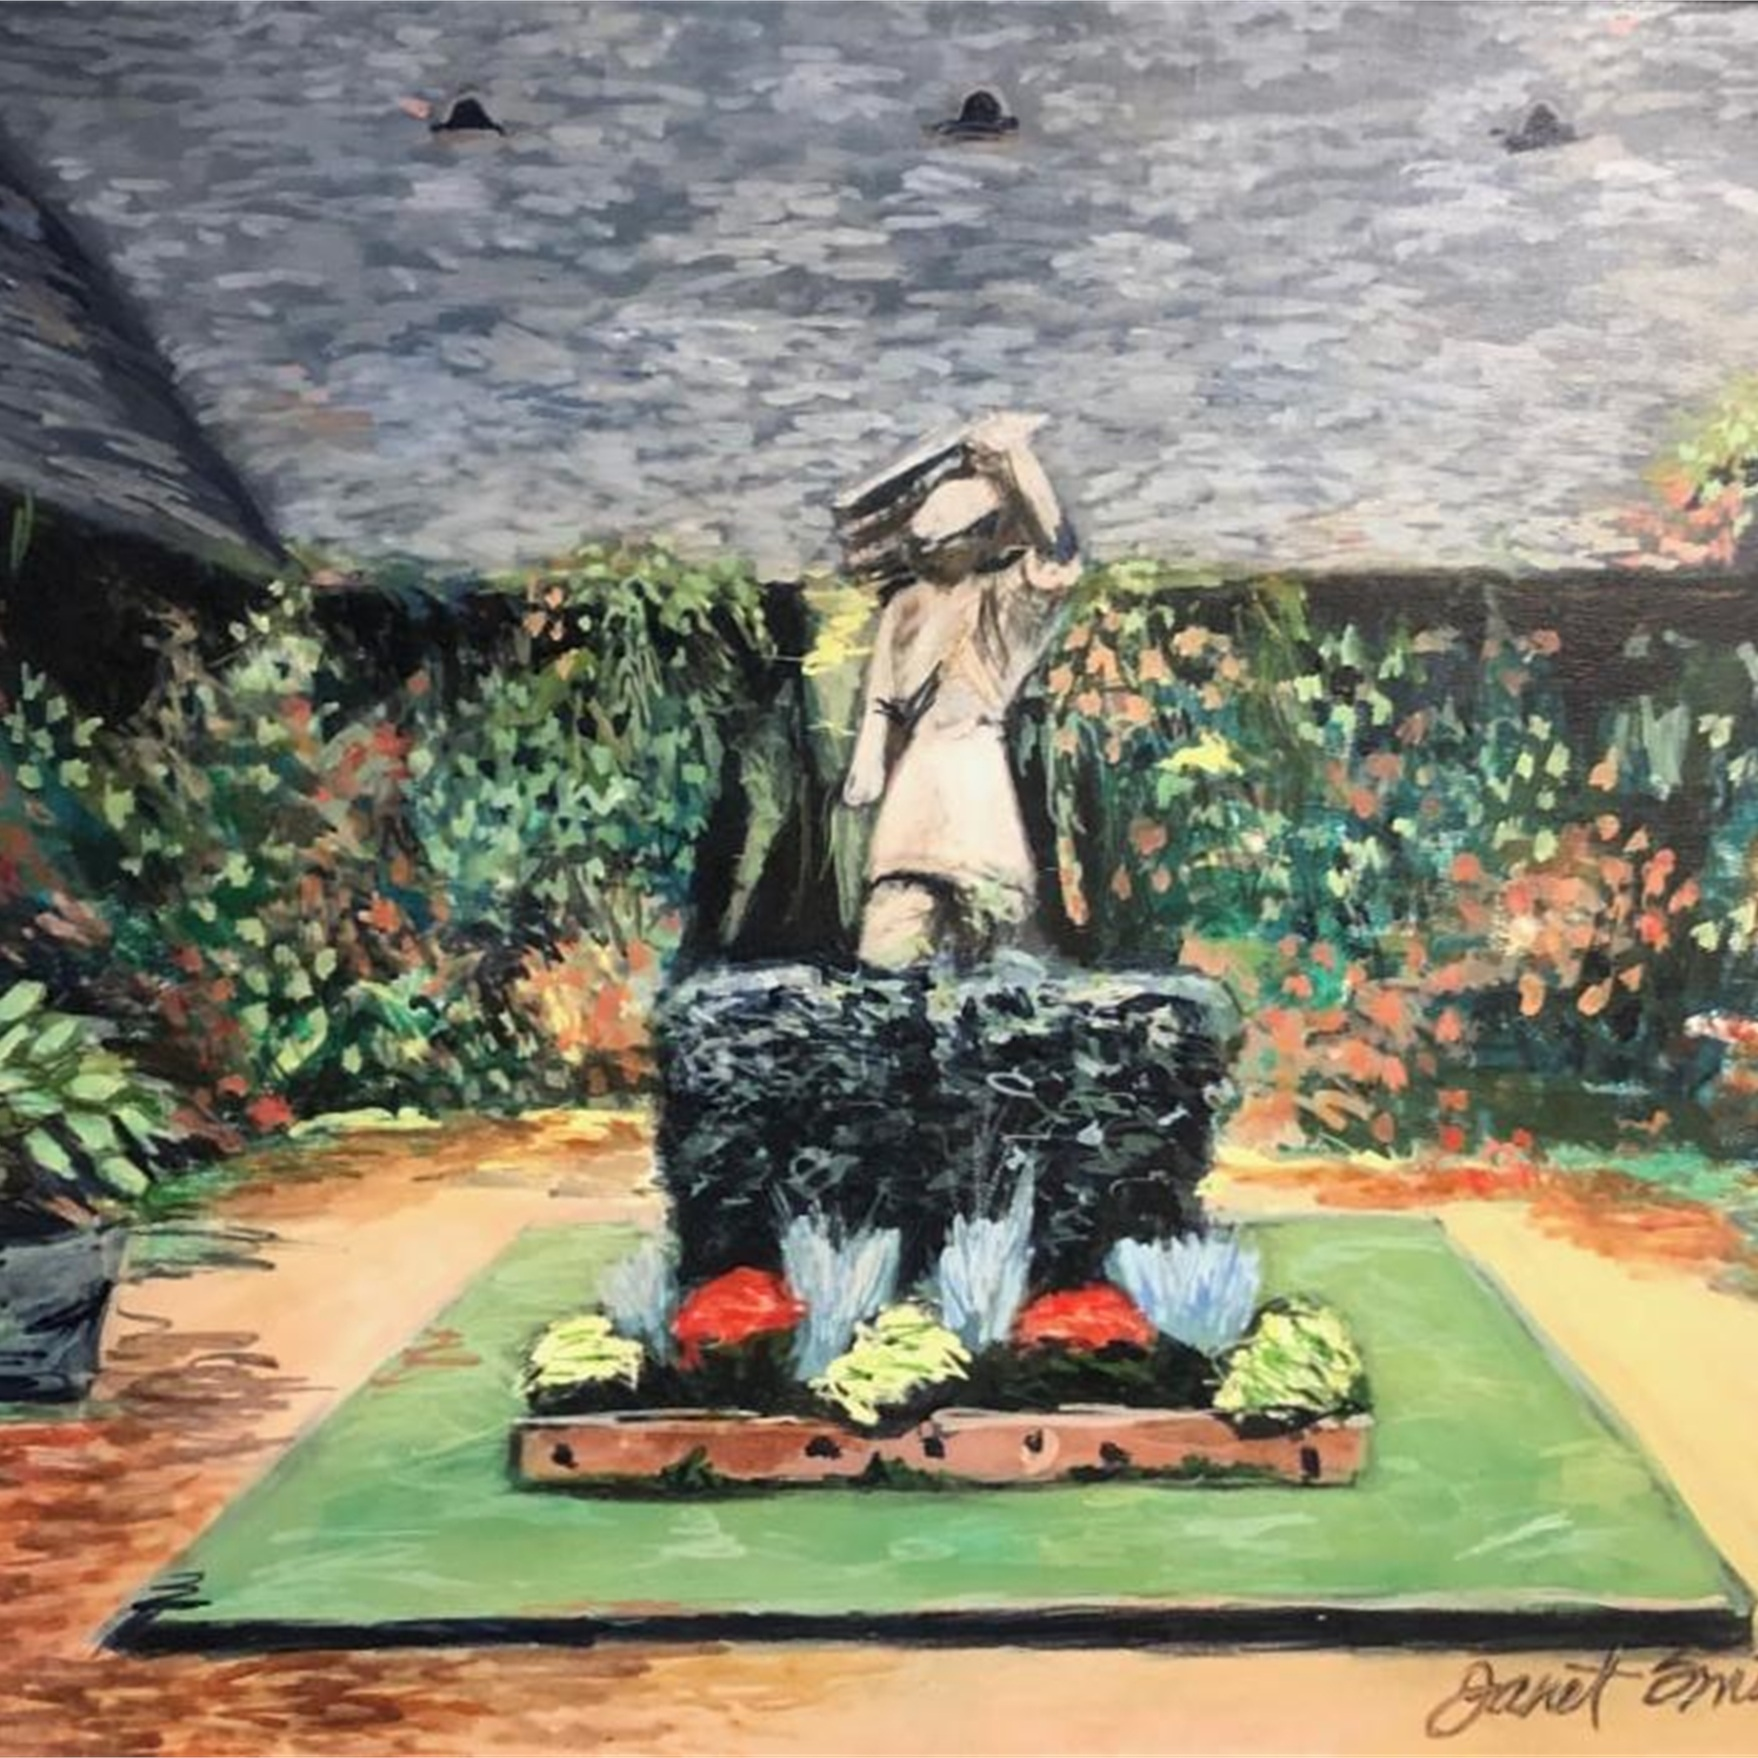 Janet SmithJustine's Garden, oil on canvas -